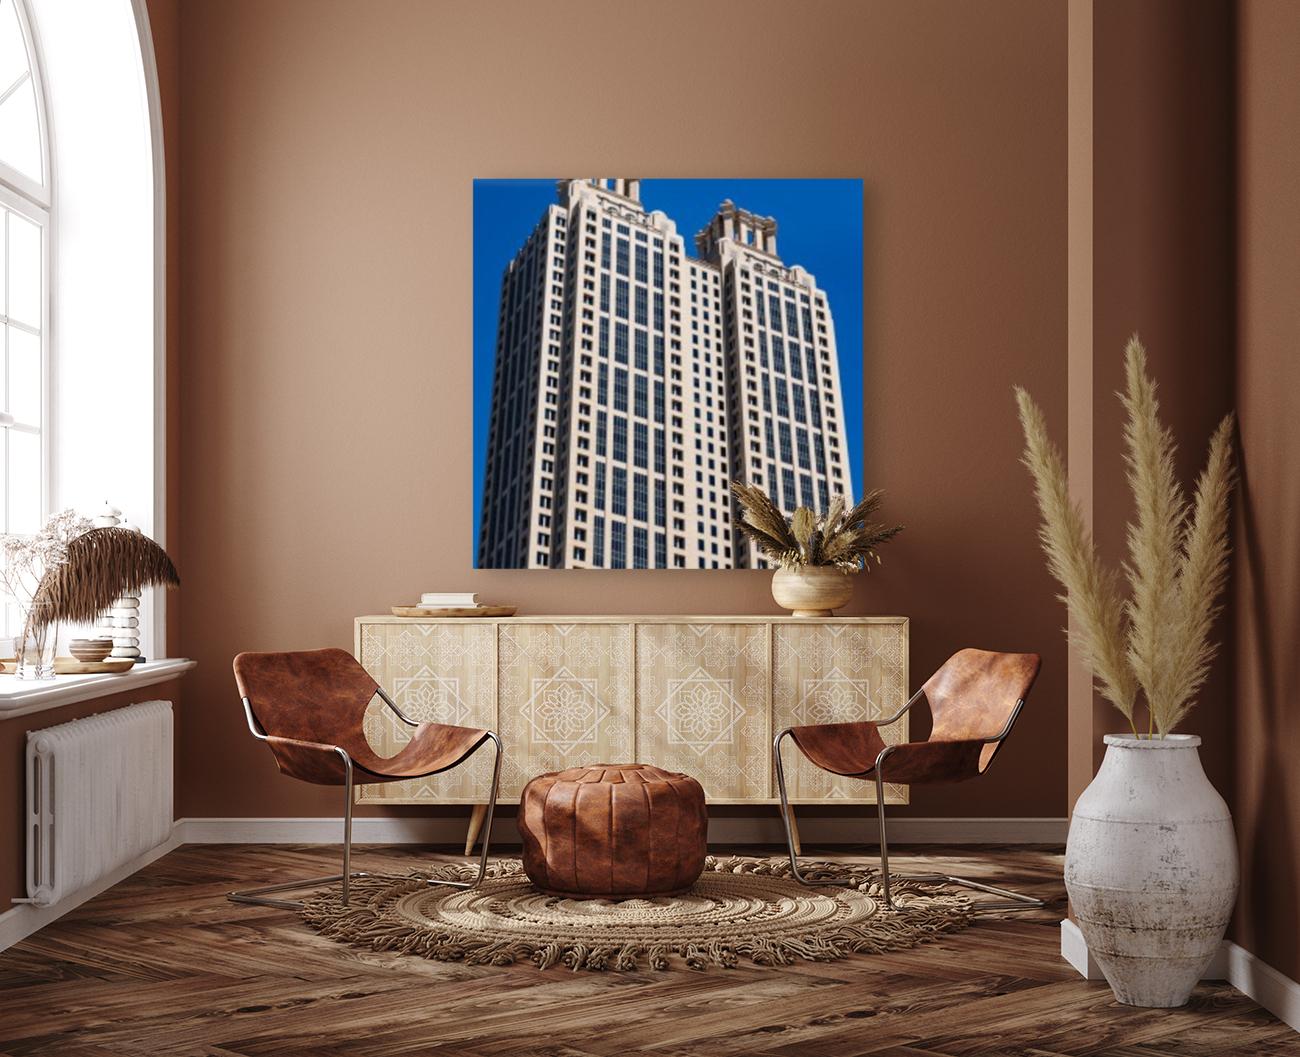 191 Peachtree Tower   Atlanta GA 6969  Art